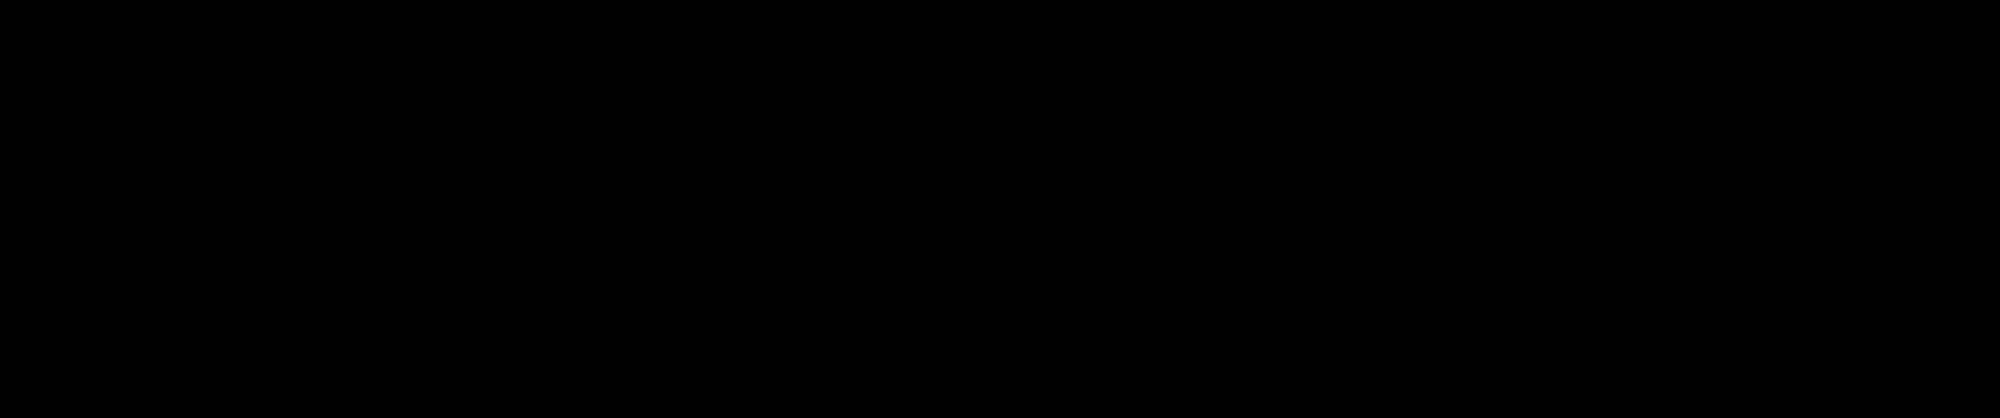 File svg wikimedia commons. Windows 95 logo png